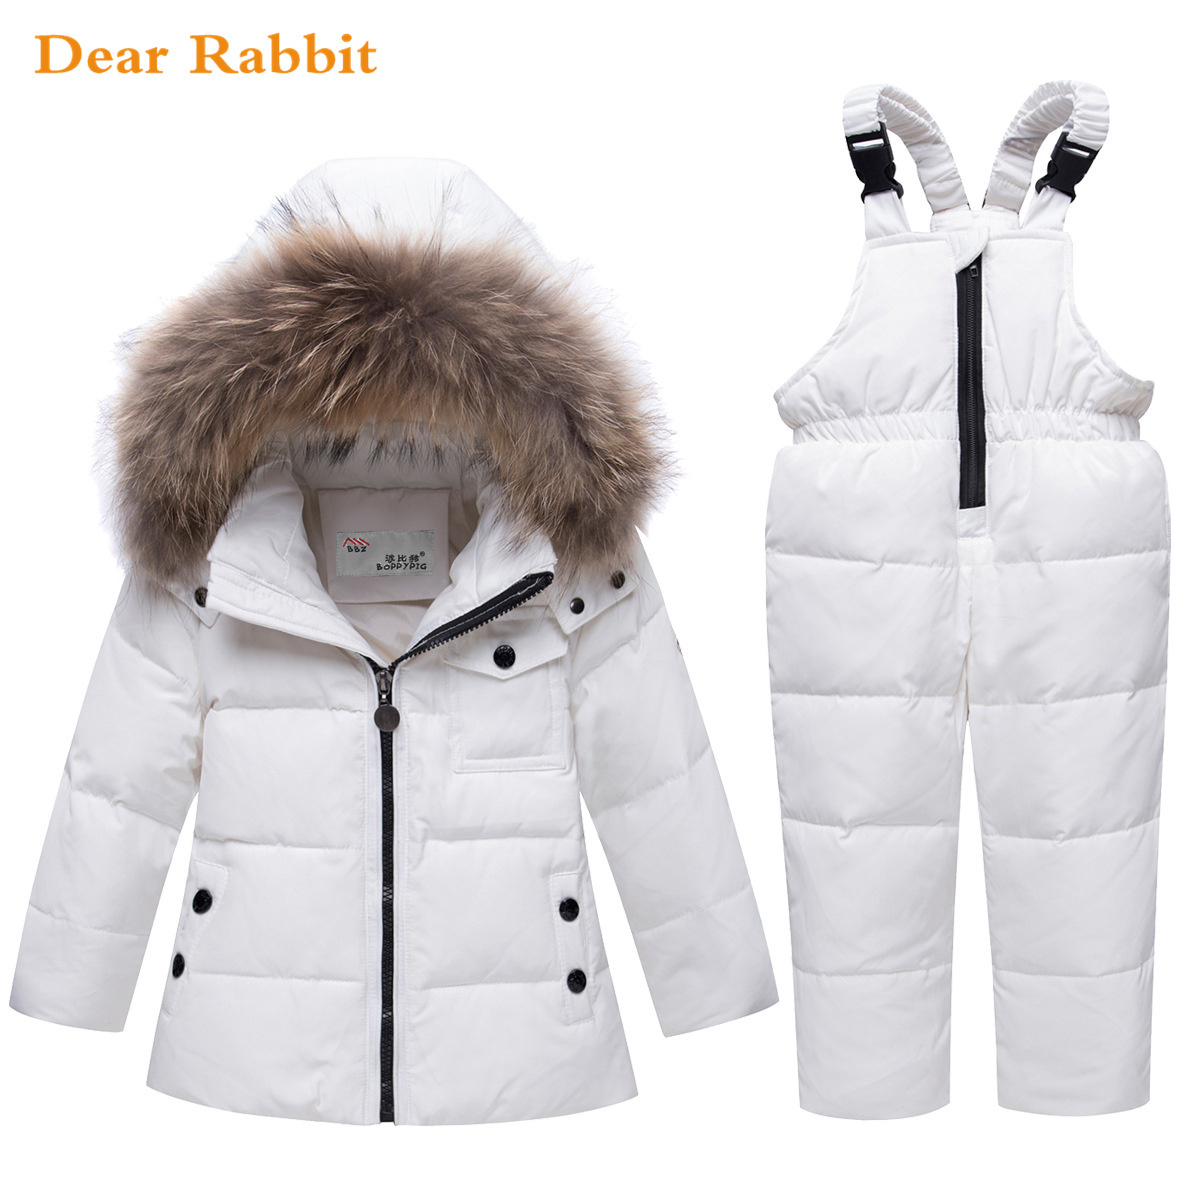 2019 children spring winter thin down jacket parka real Fur boy baby overalls kids coat snowsuit